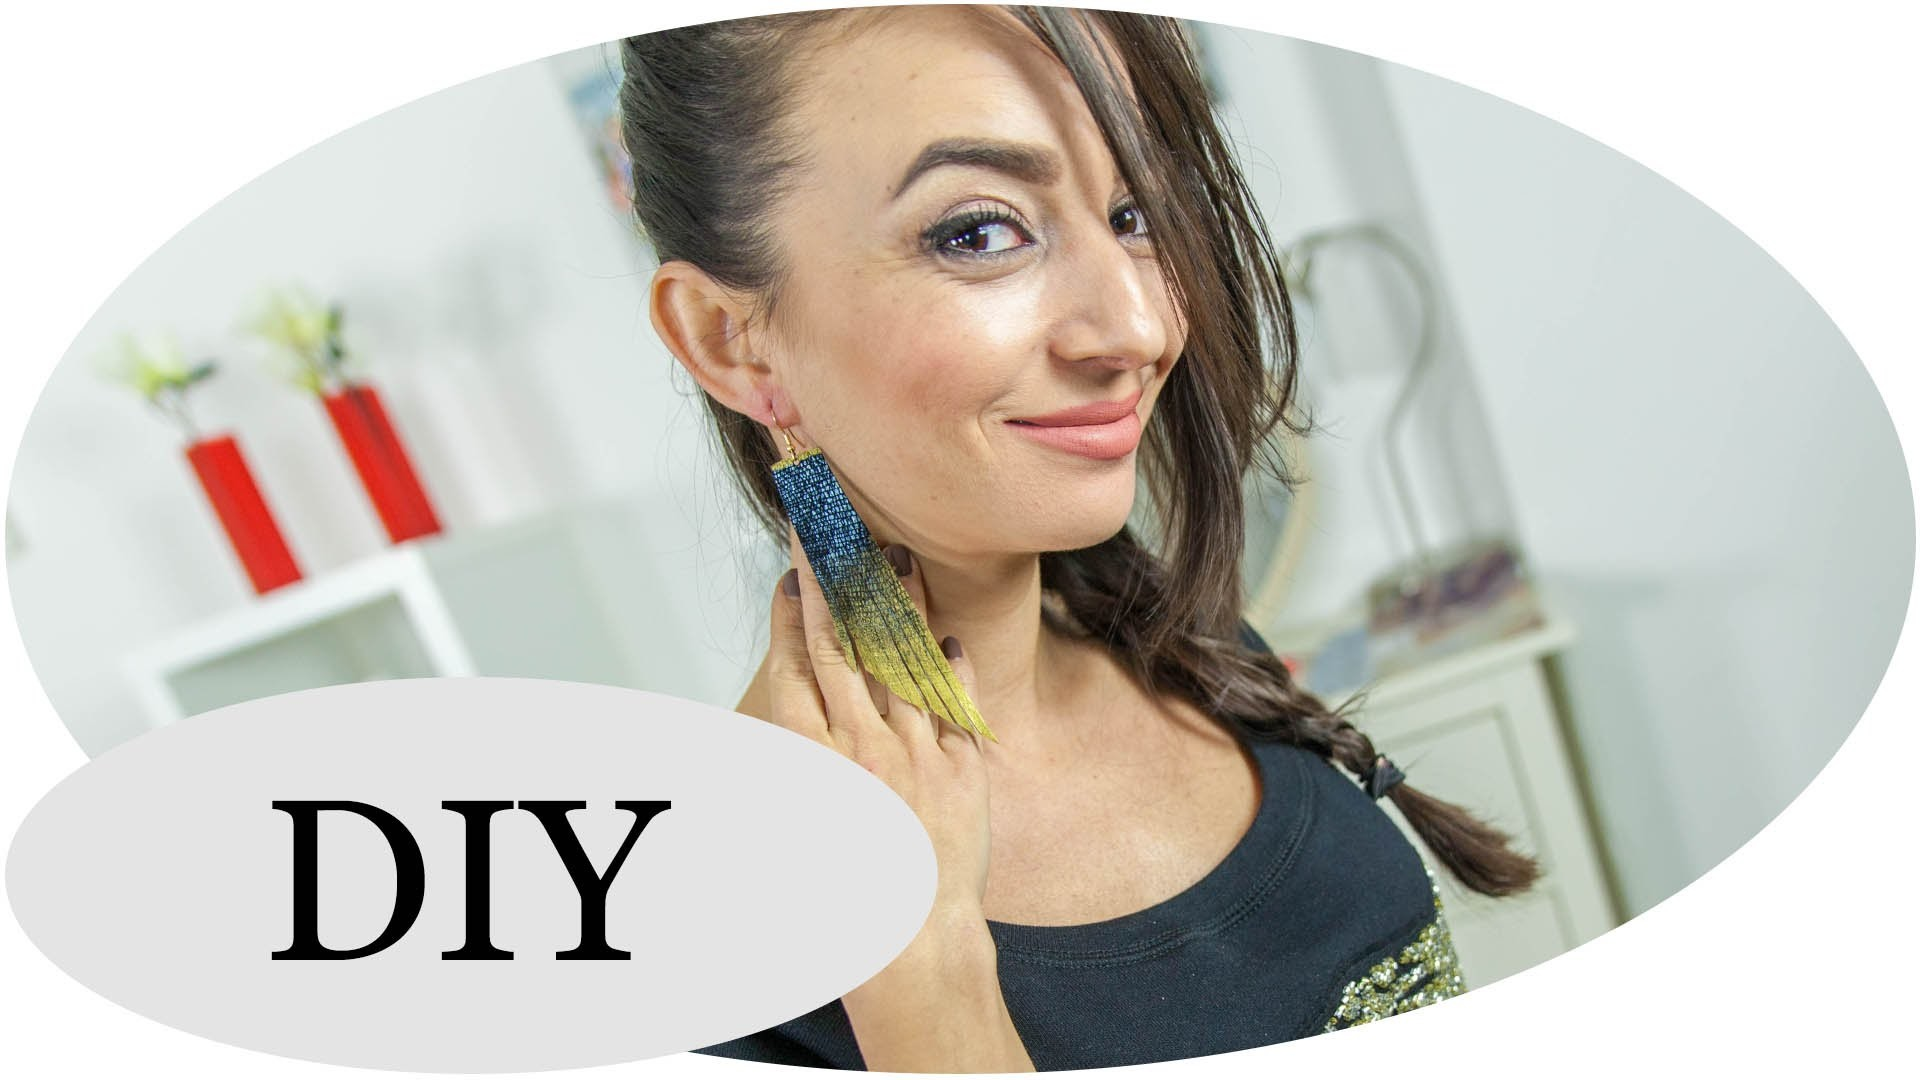 DIY: Ohrringe im angesagten Fransen-Look